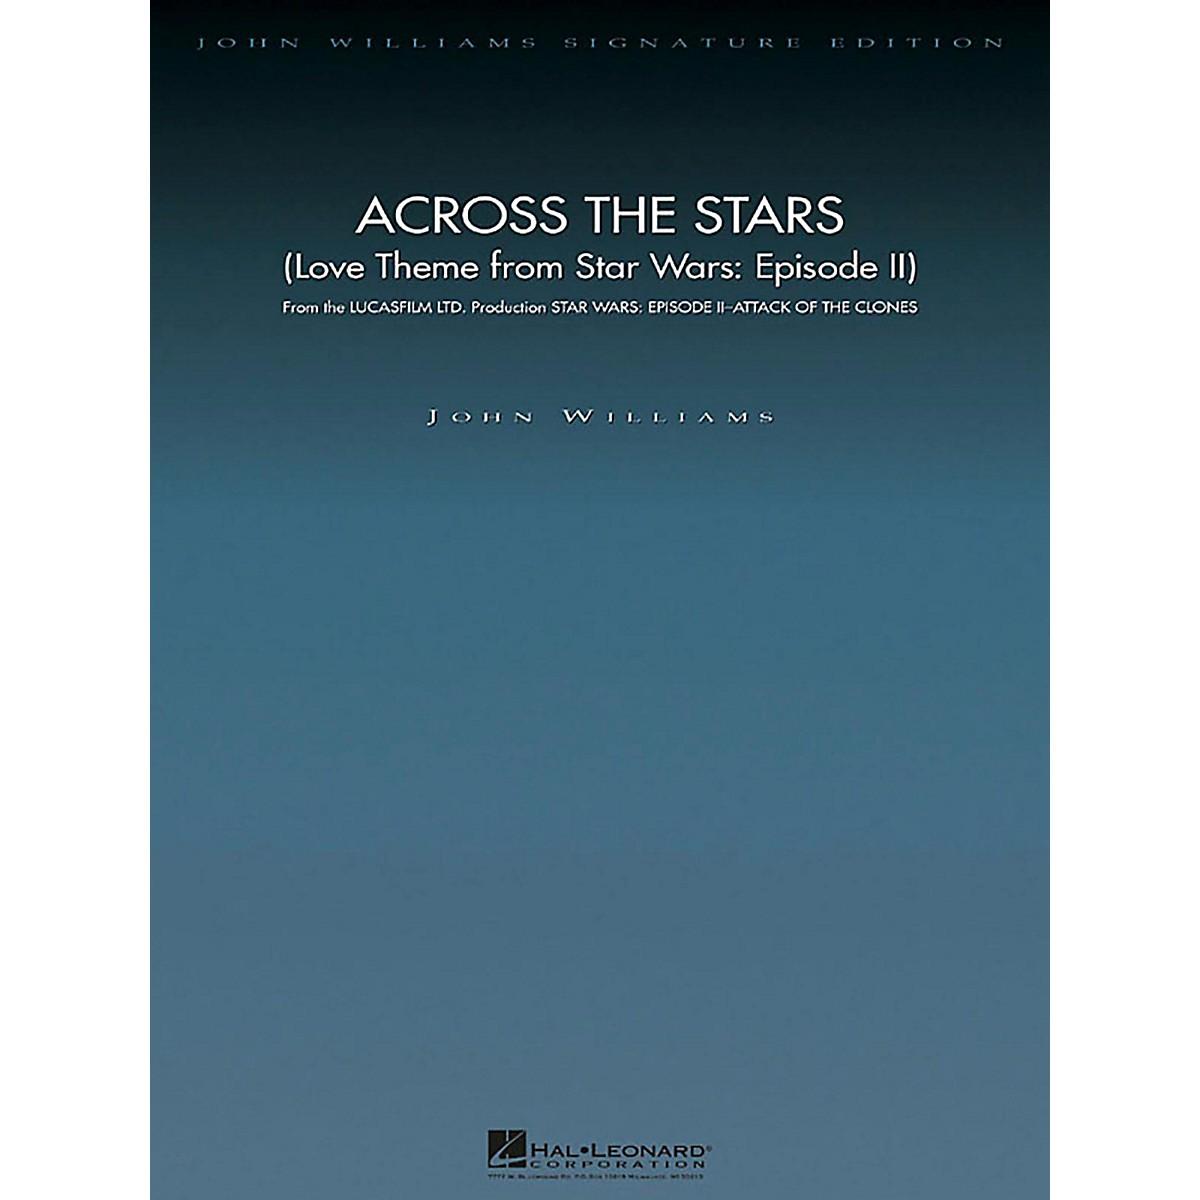 Hal Leonard Across the Stars (Love Theme Star Wars: Episode II) John Williams Signature ED Orchestra DLX Score